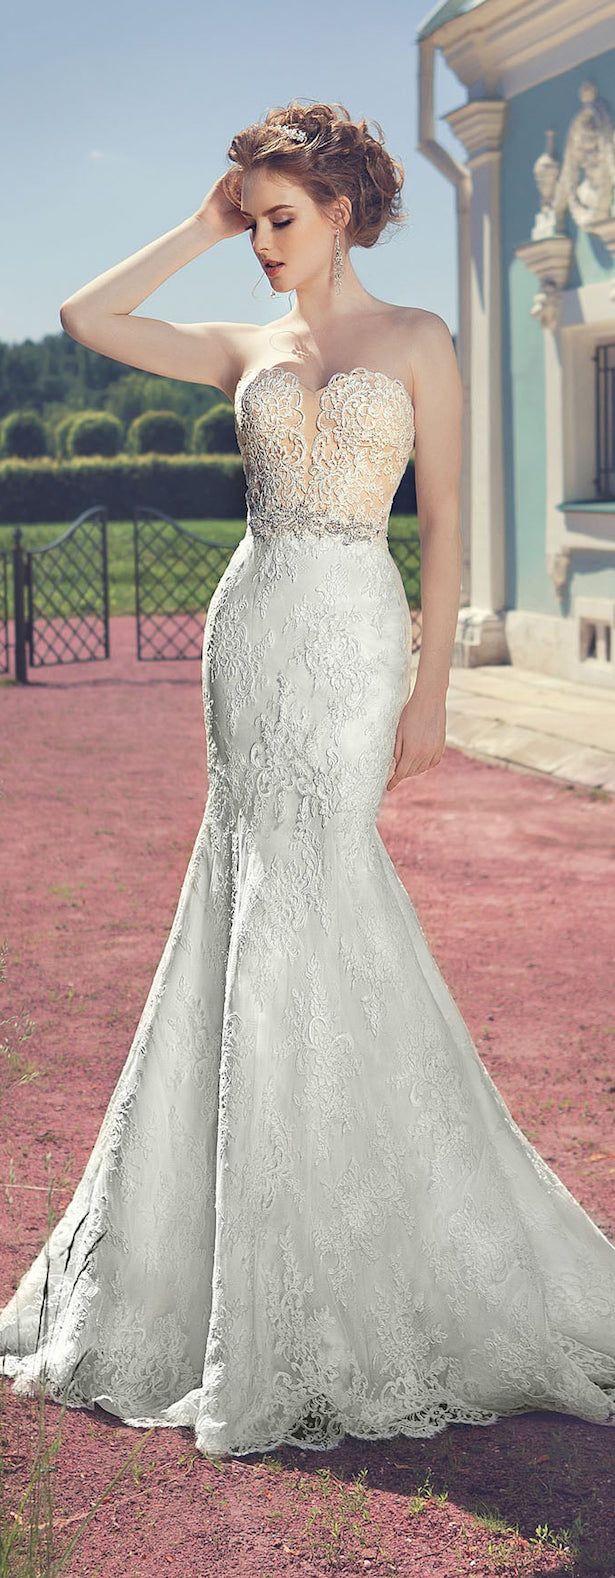 Vestido de novia sencillo pero bonito